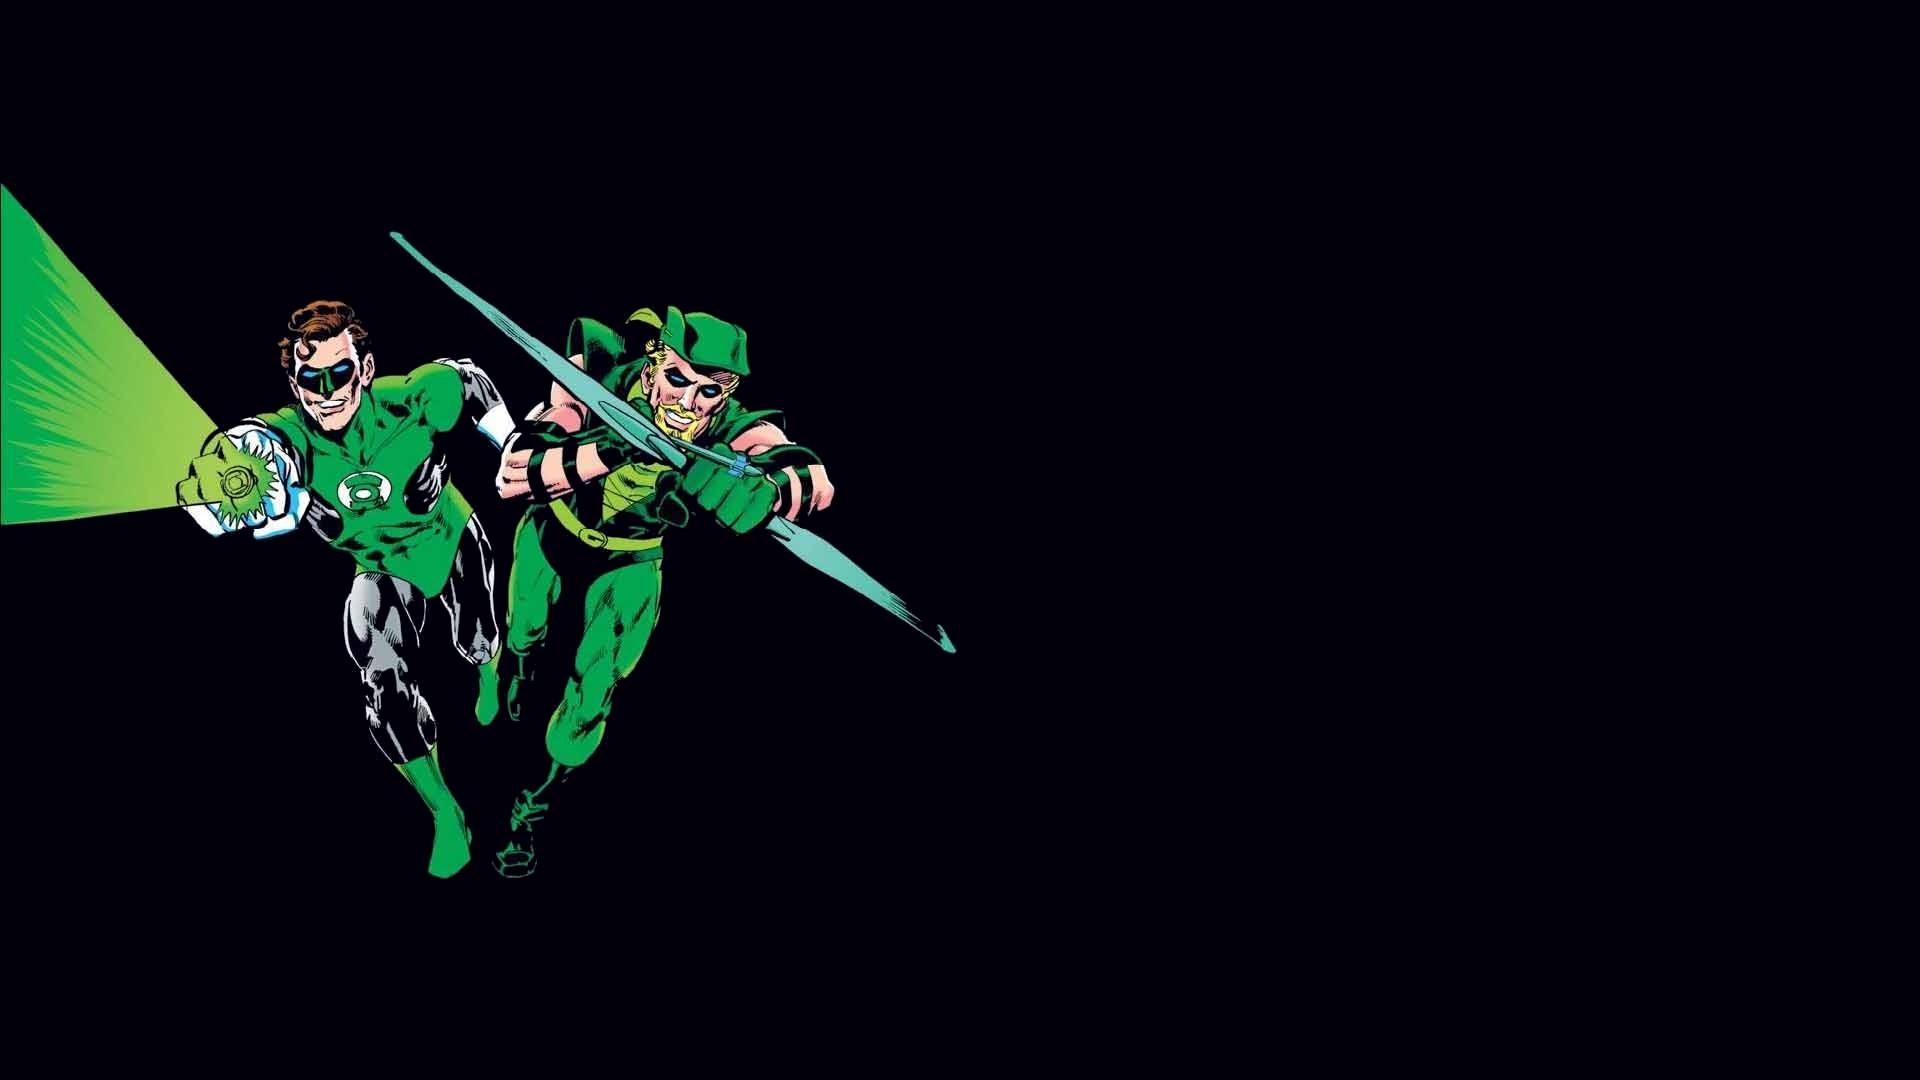 Comics – Collage Green Arrow Green Lantern Wallpaper